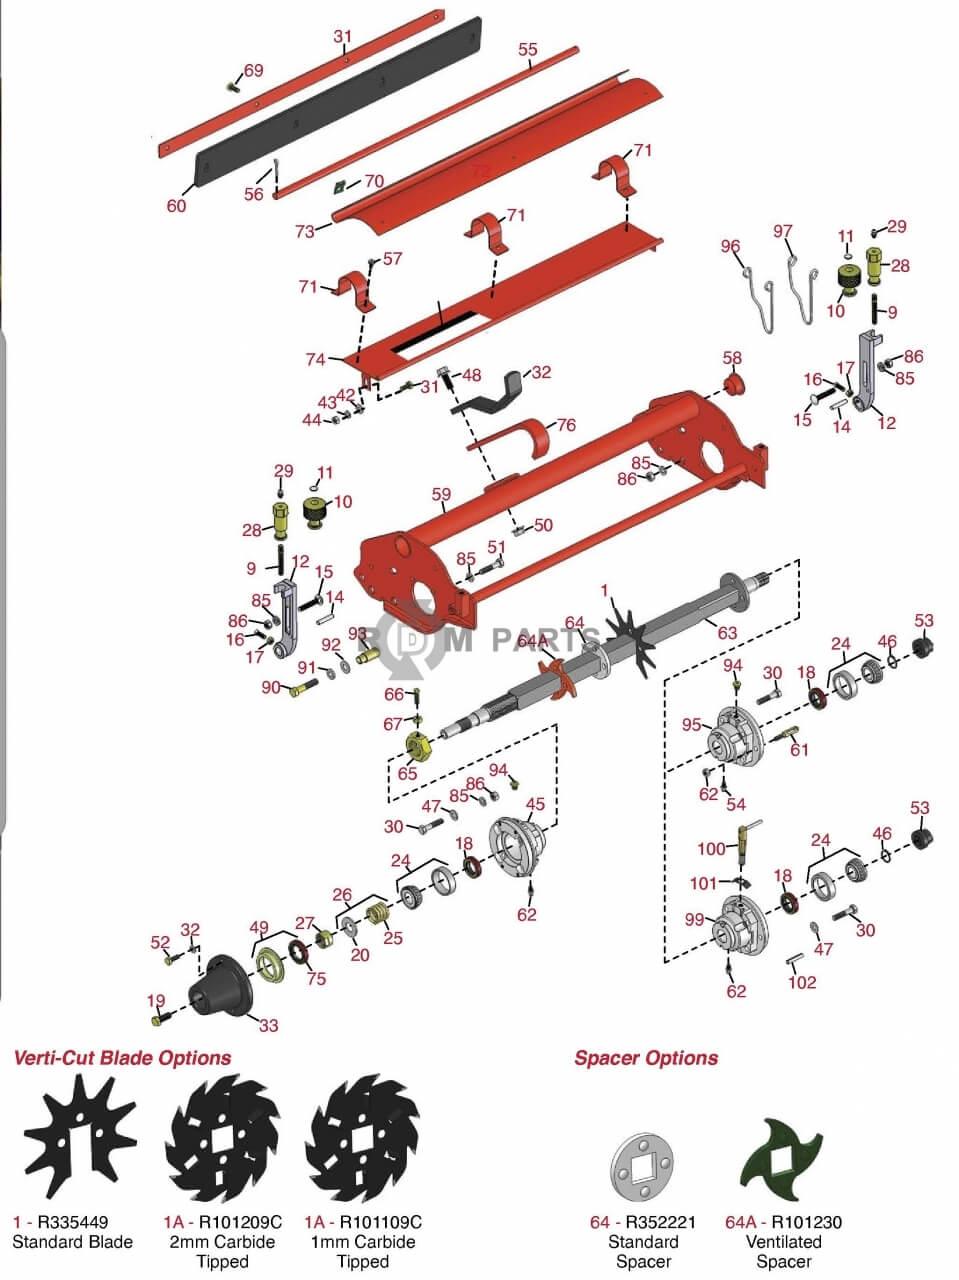 Fantastic Cushman Titan Wiring Diagram Component - Electrical Wiring ...